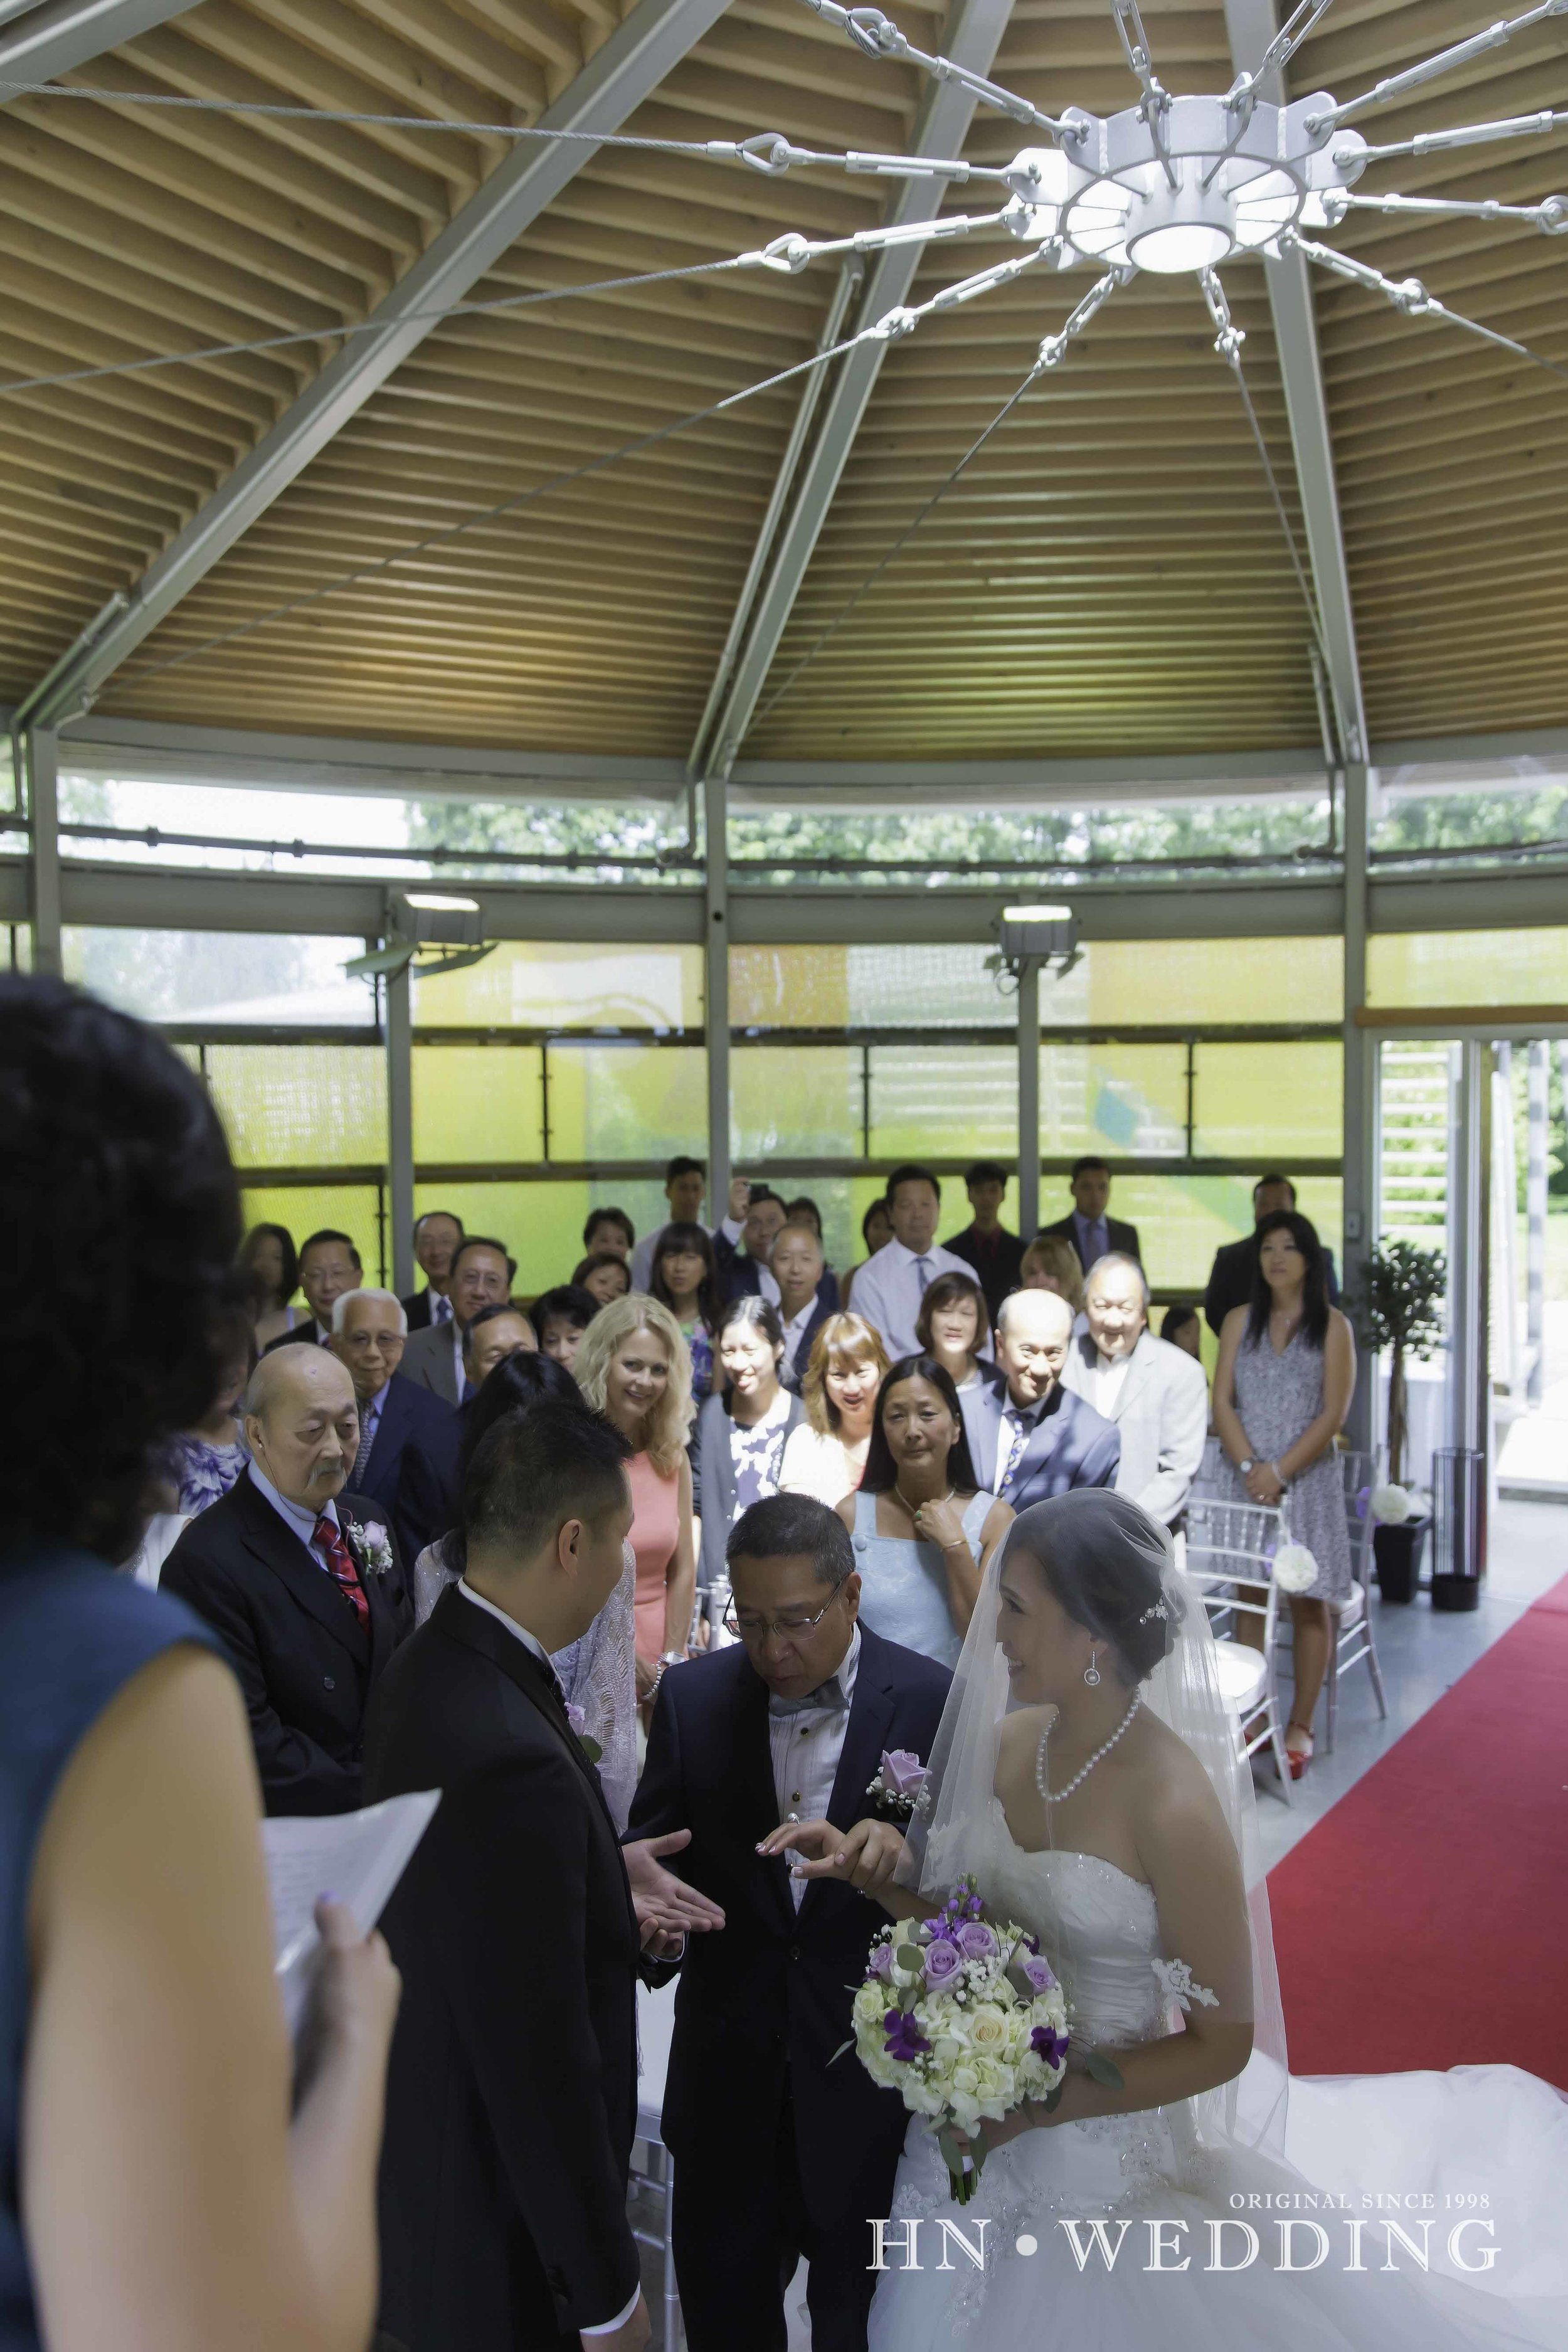 HNwedding-20160822-wedding-6136.jpg